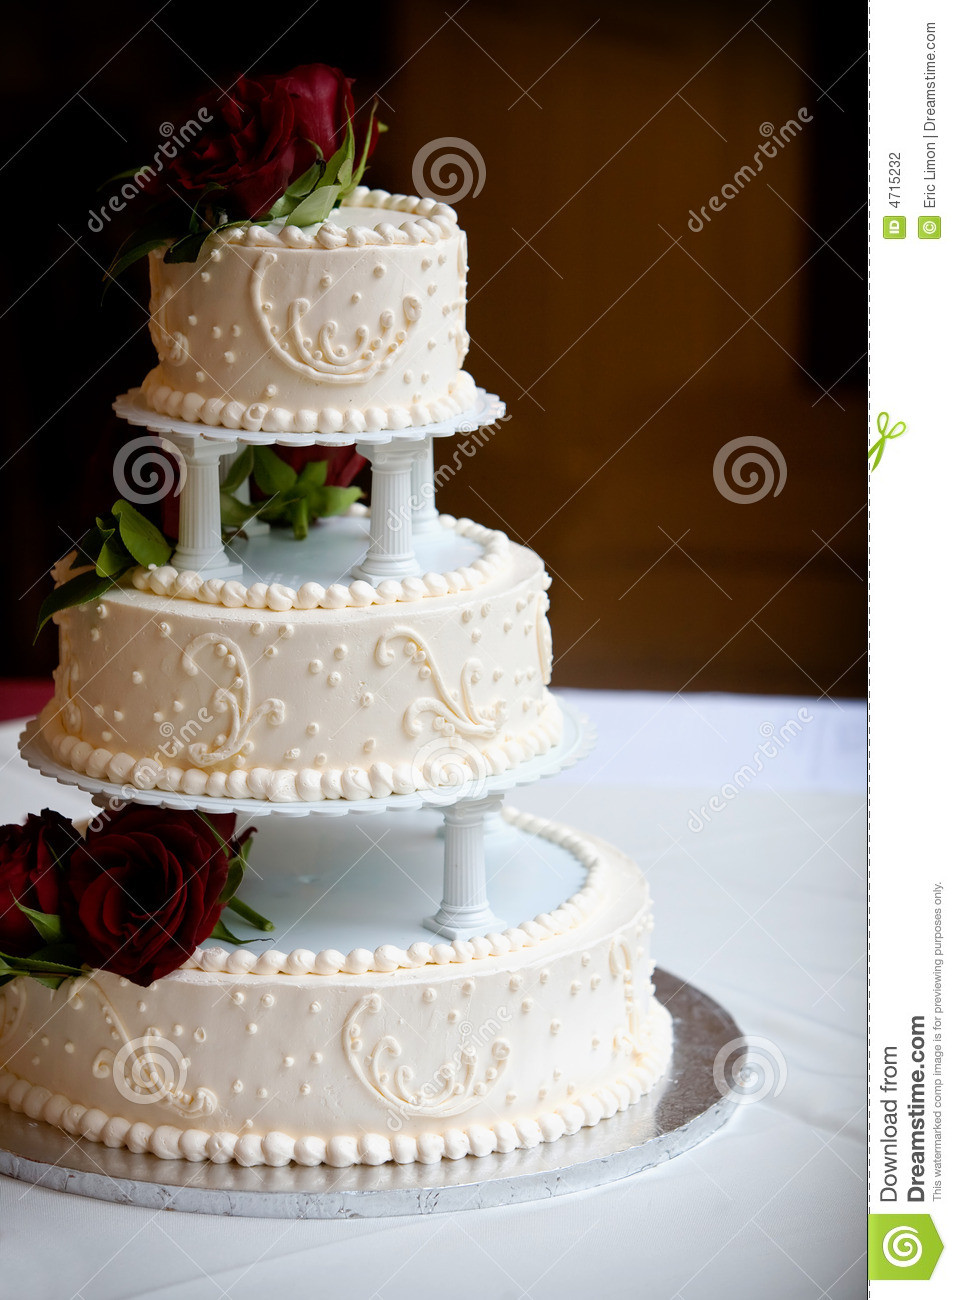 Wedding Cakes Tiers  Wedding Cake With Three Tiers Stock Image of